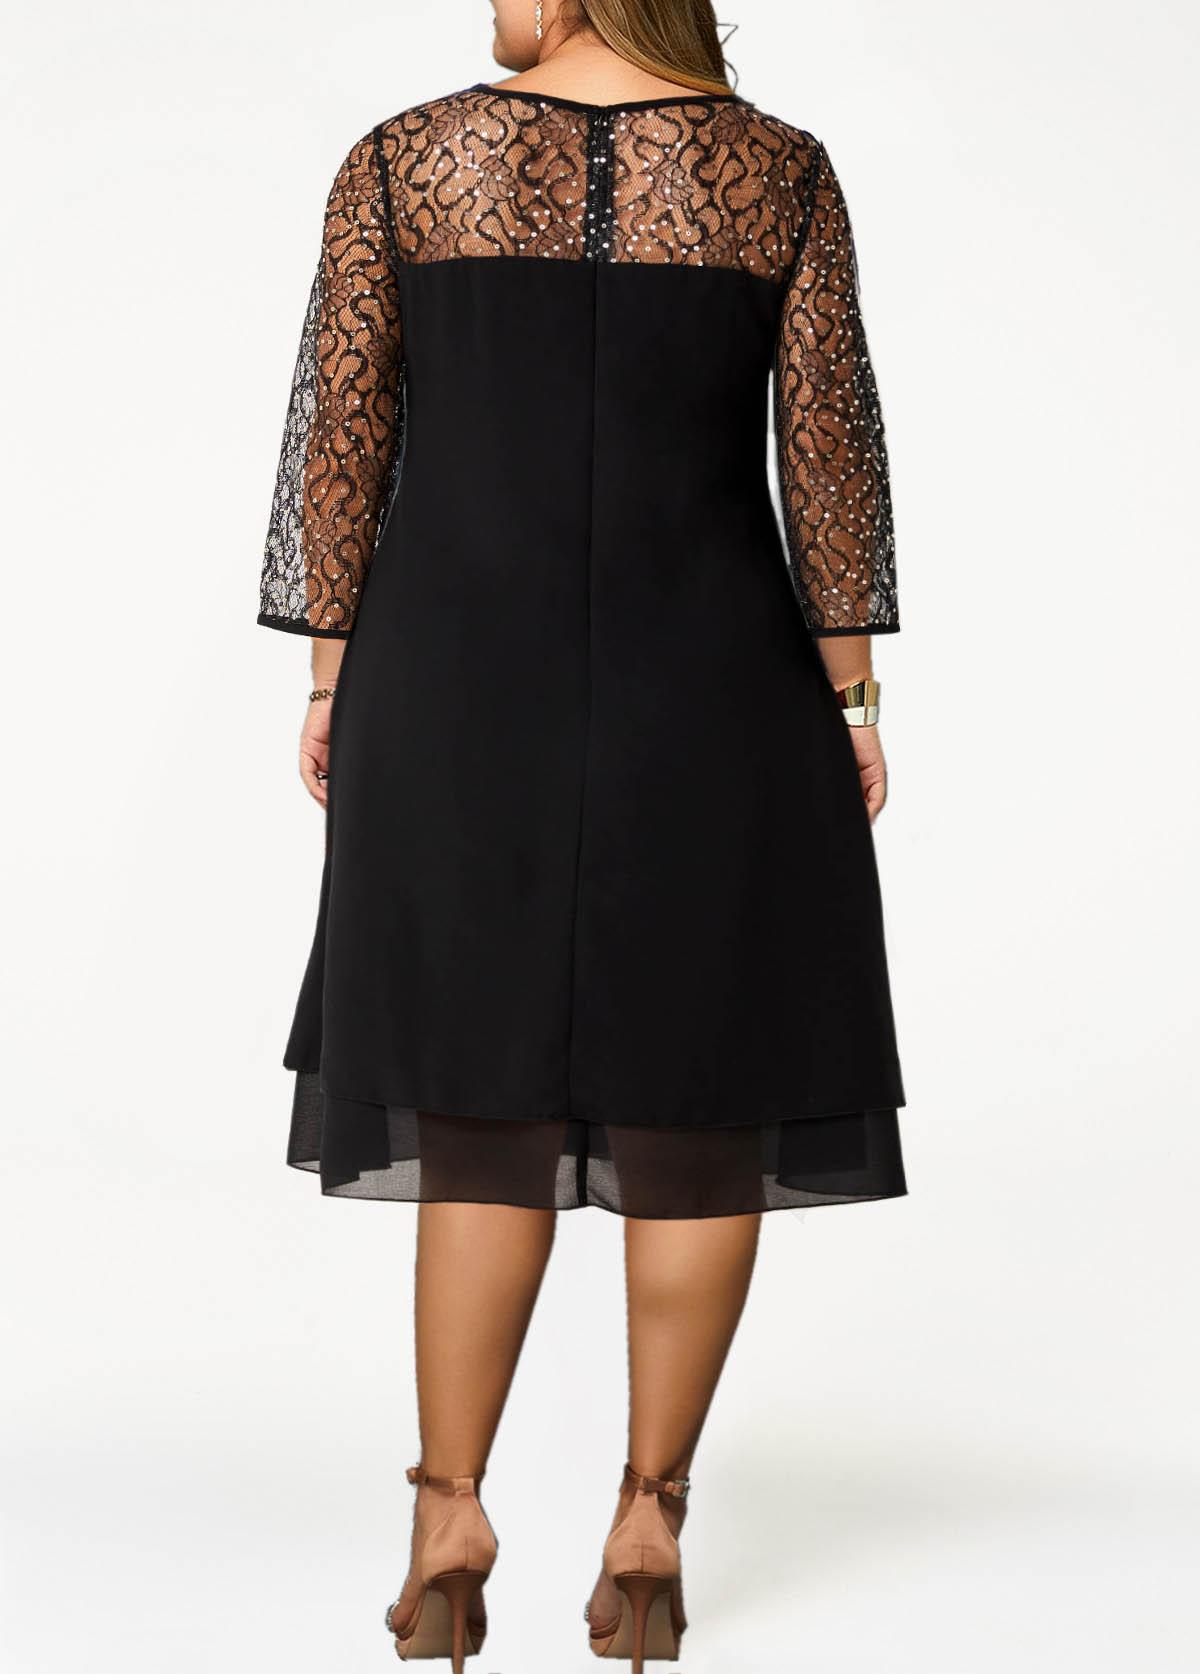 Sequin Plus Size Round Neck 3/4 Sleeve Dress